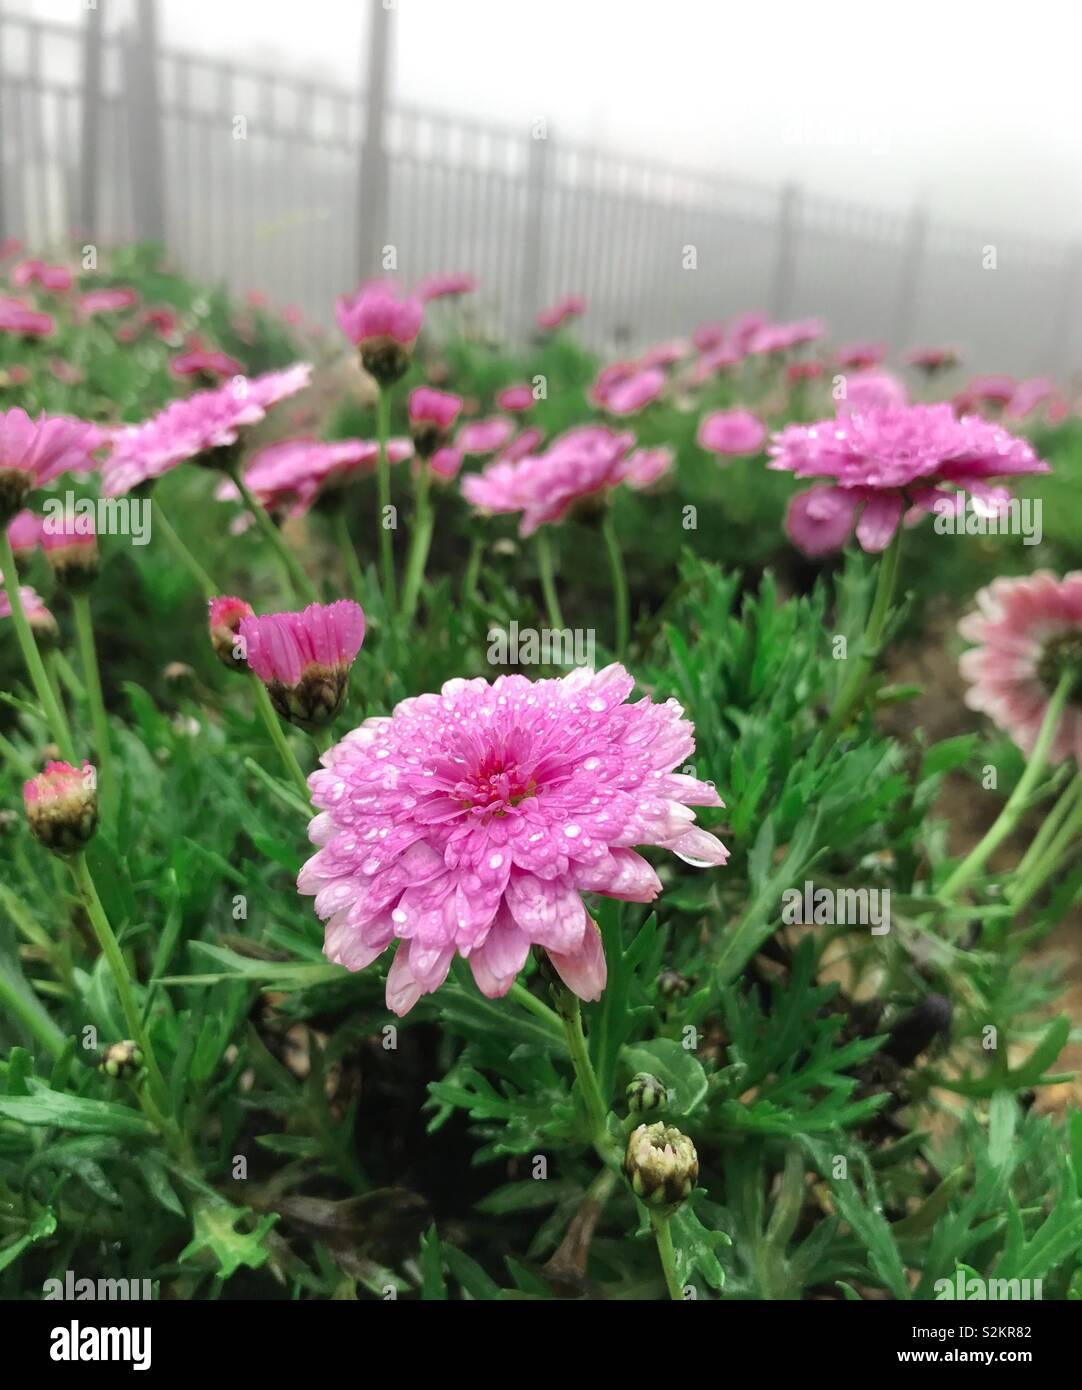 Pinky Flowers - Stock Image